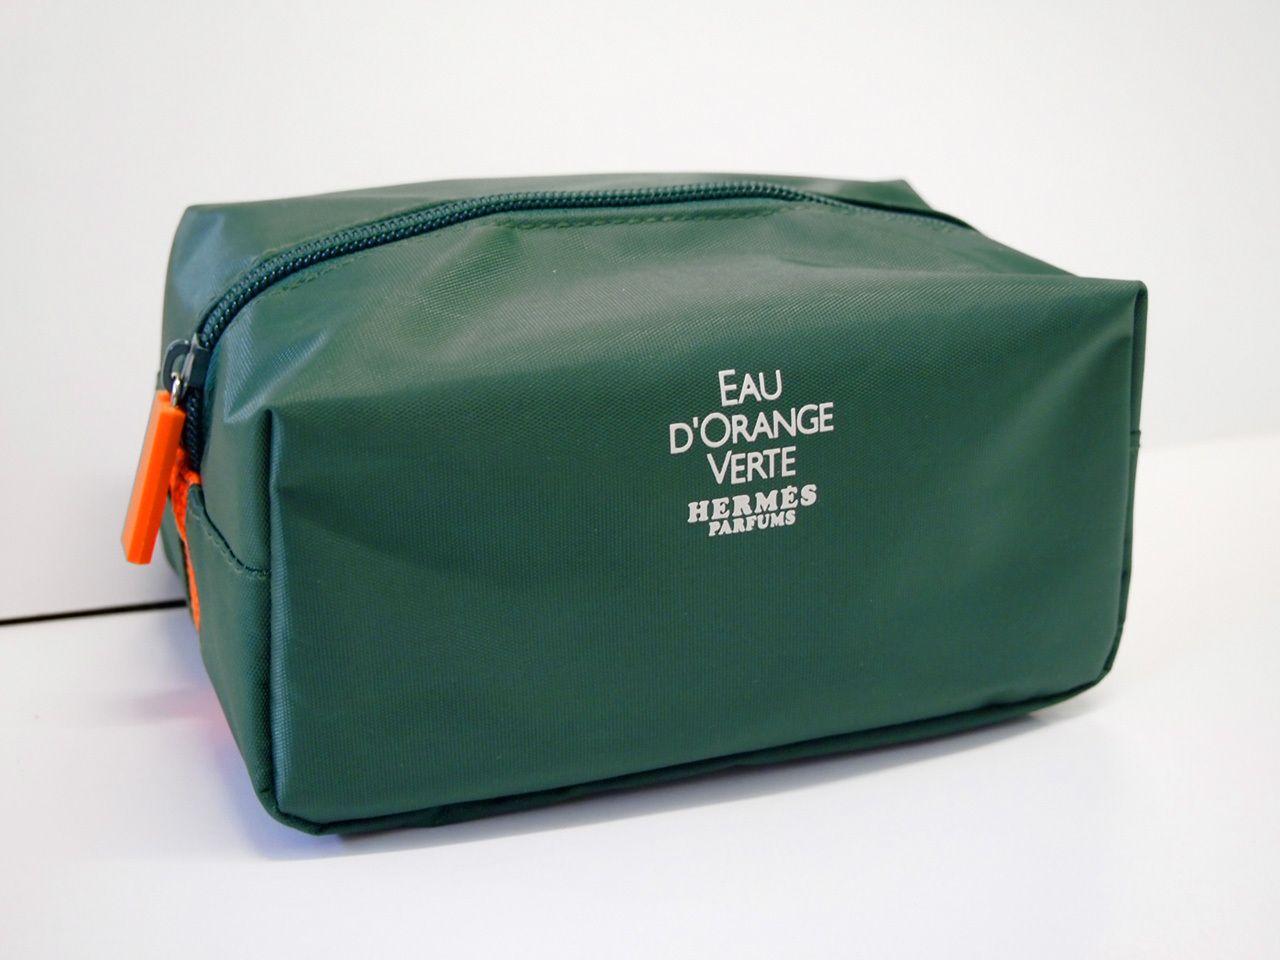 Auth Chanel Black cosmetic travel makeup pouch brush bag case with mirror  Material  Black Nylon Measurement  16.5cm x 12cm x 4.5 cm   6.6